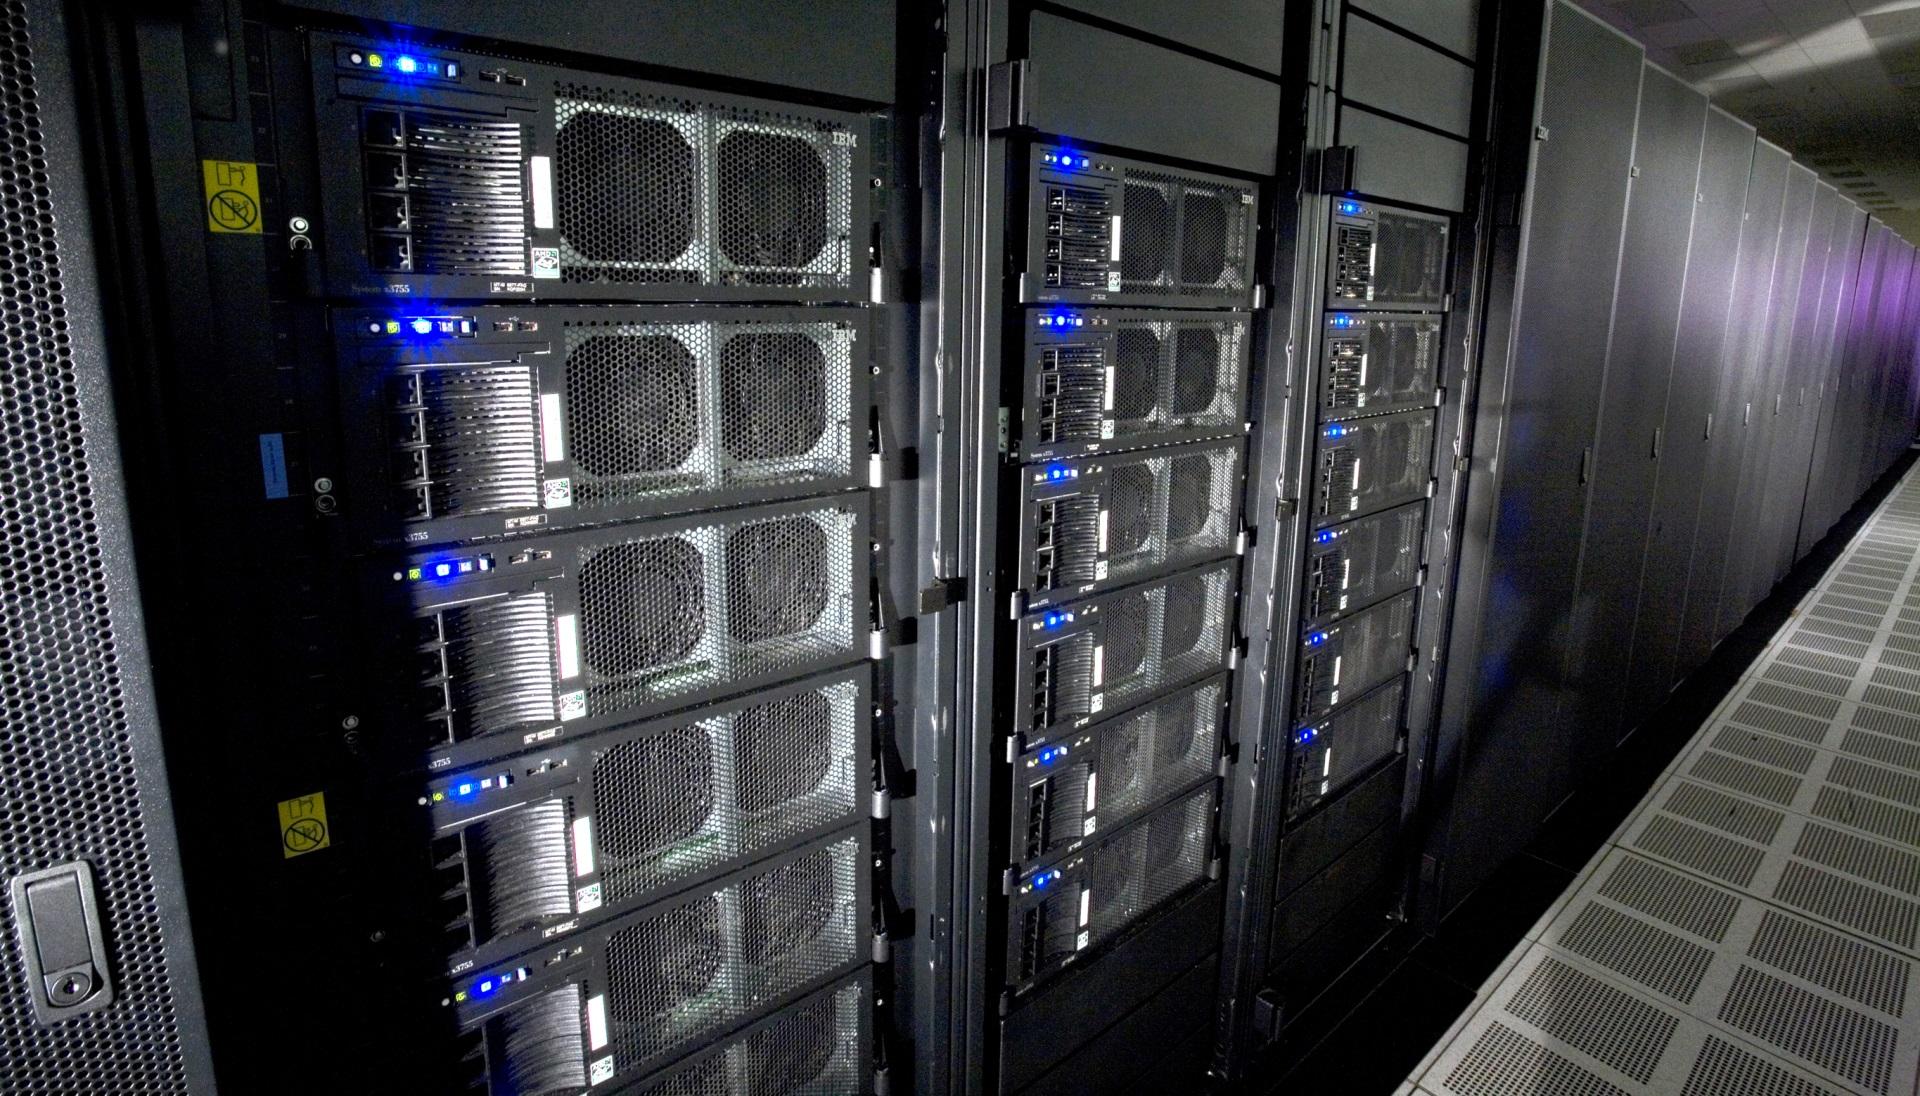 Roadrunner supercomputer via Wikipedia